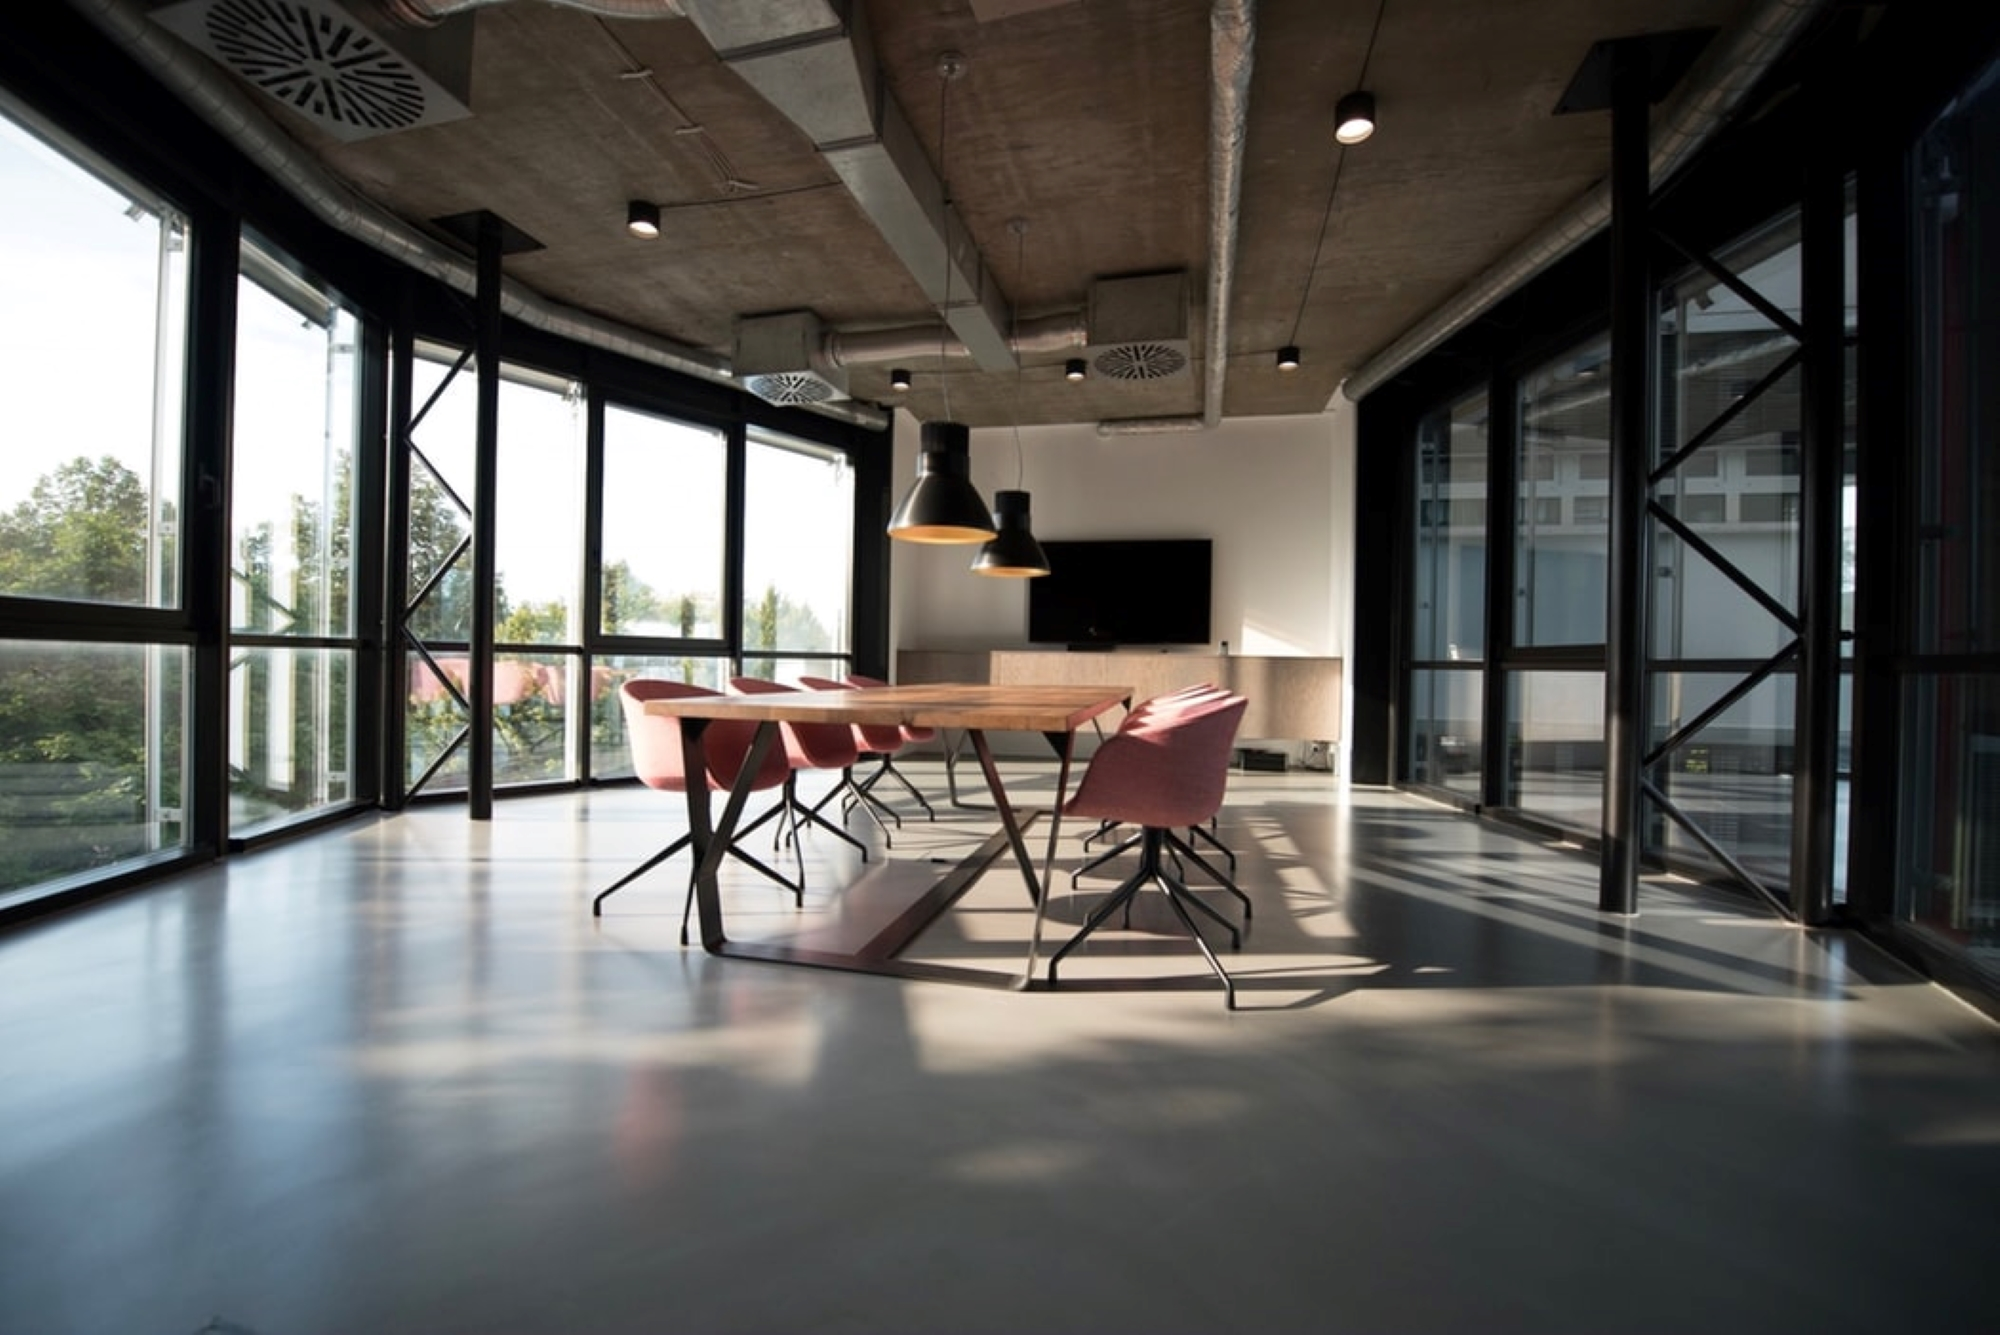 Office room 2.0